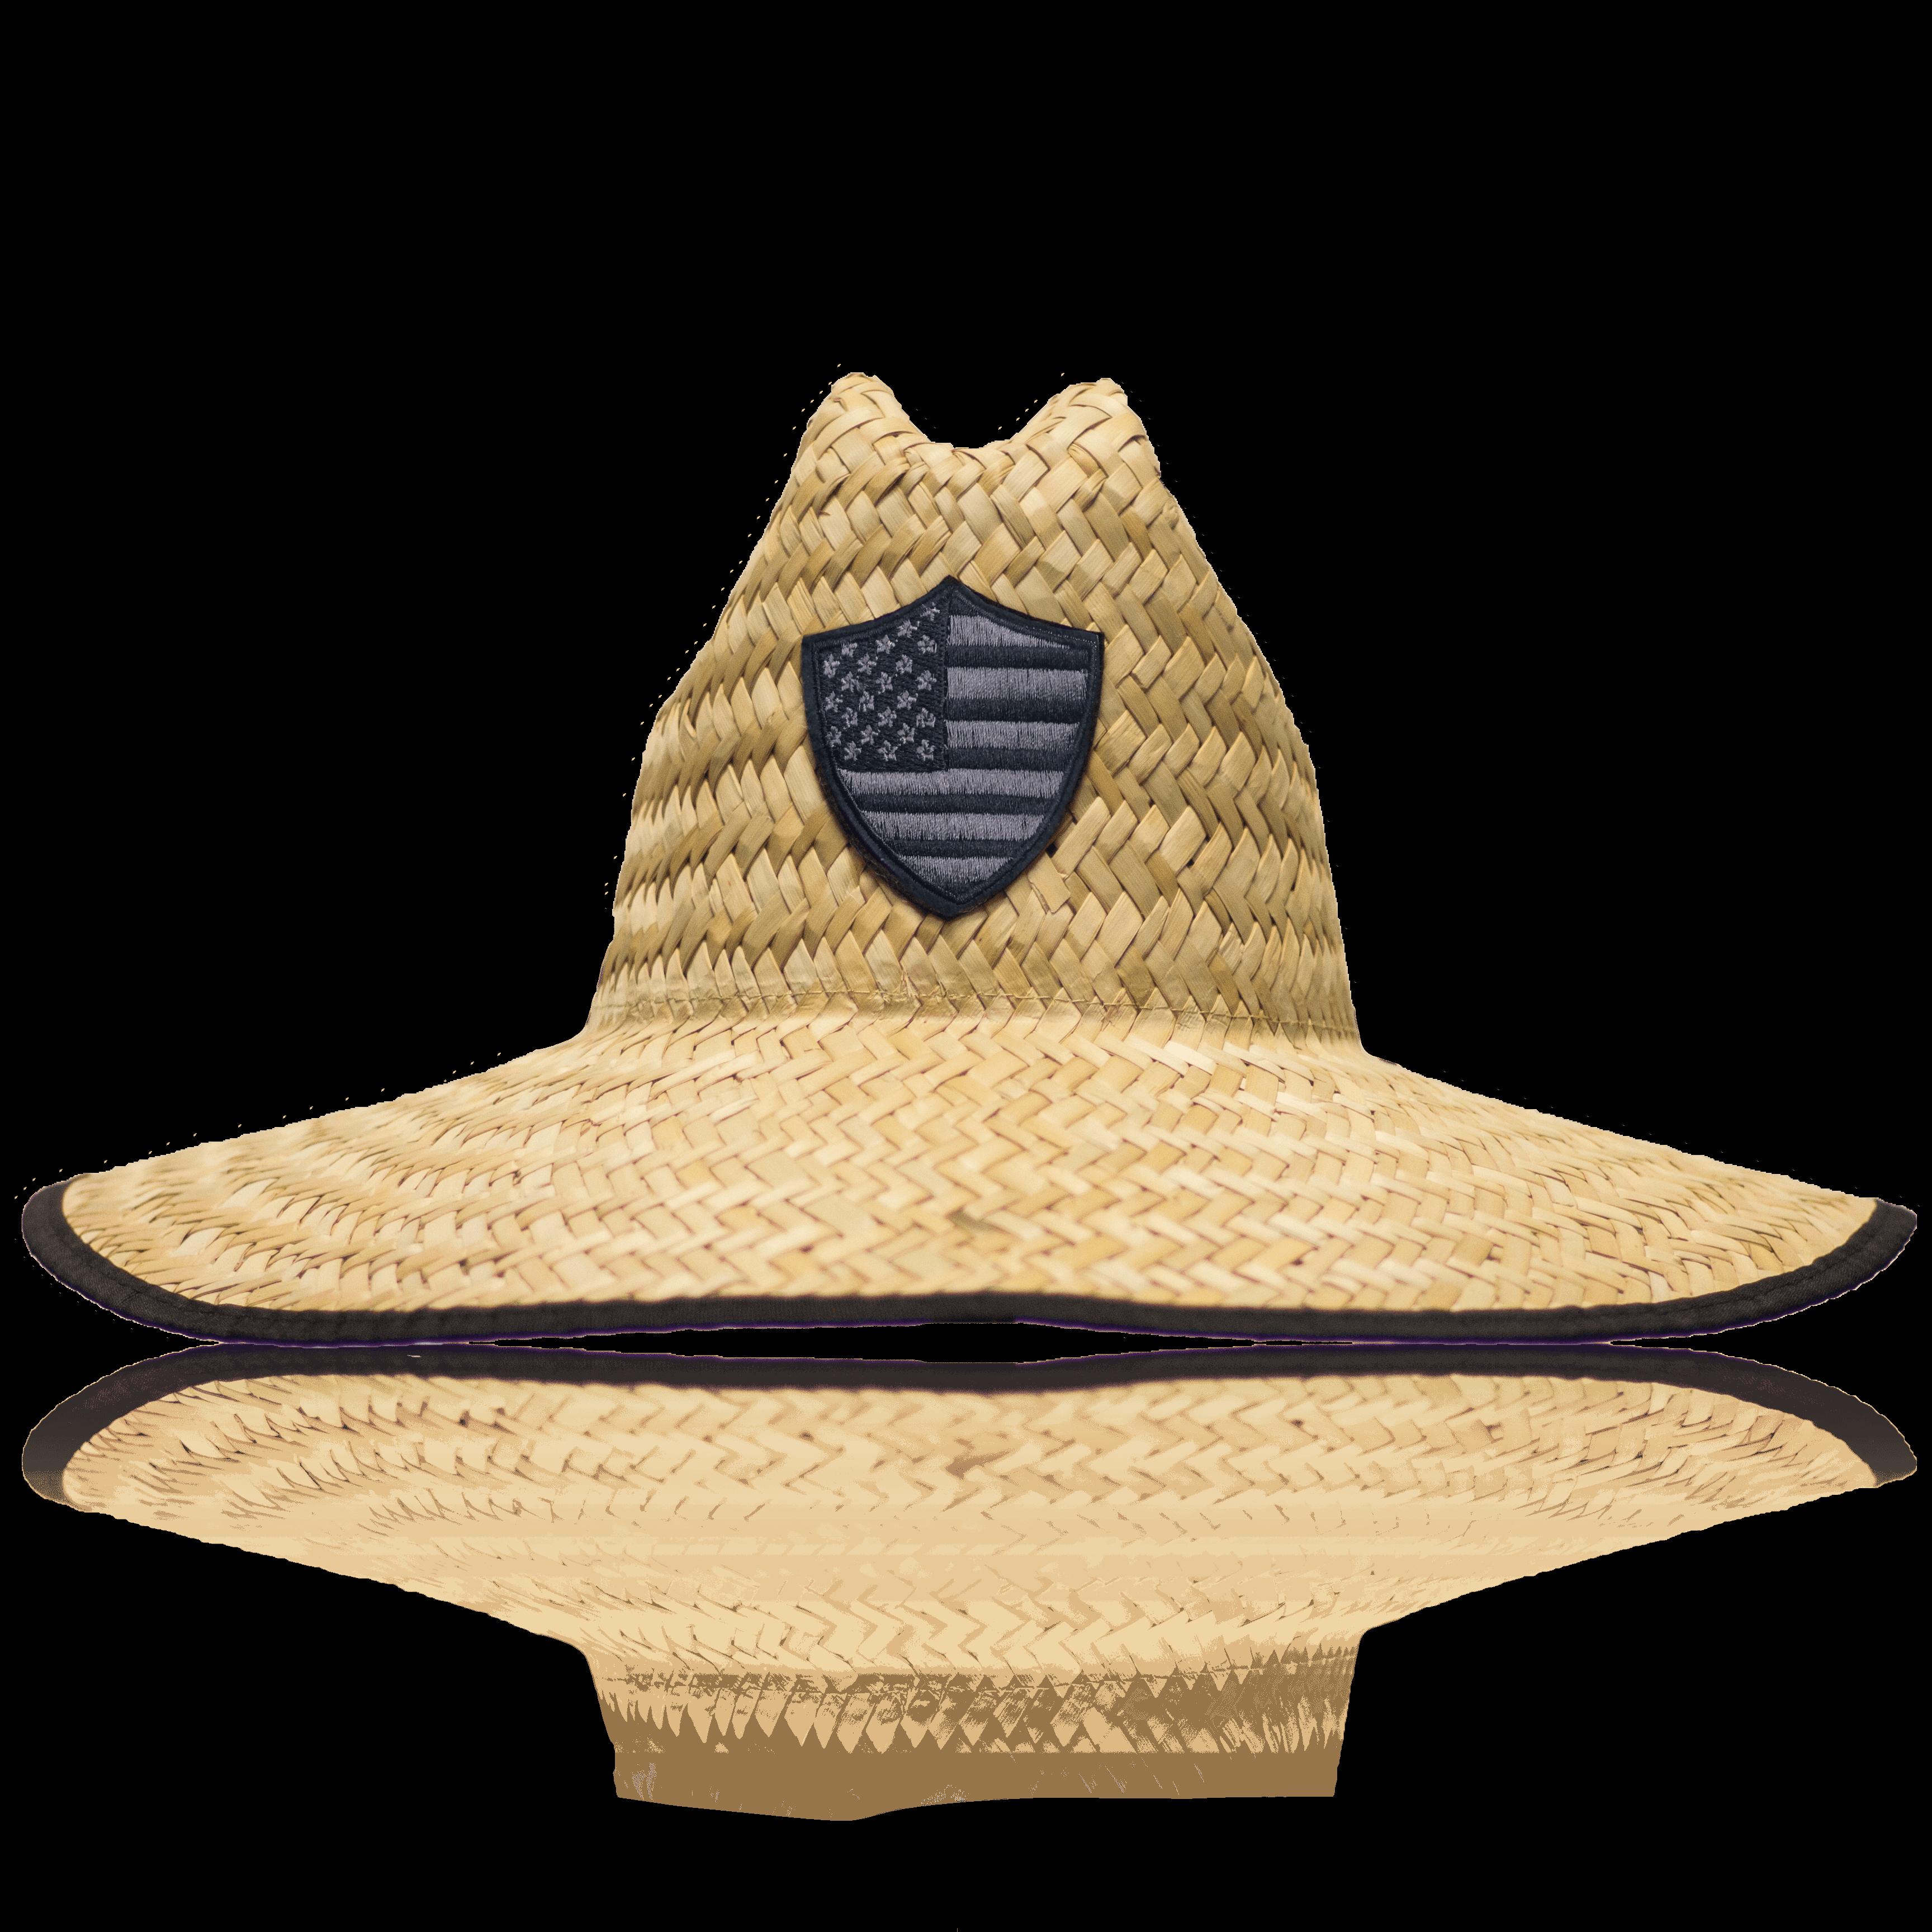 Straw Hat Blackout American Shield 1 Png 3 456 3 456 Pixels Hats For Men Ankle Strap Heels Straw Hat